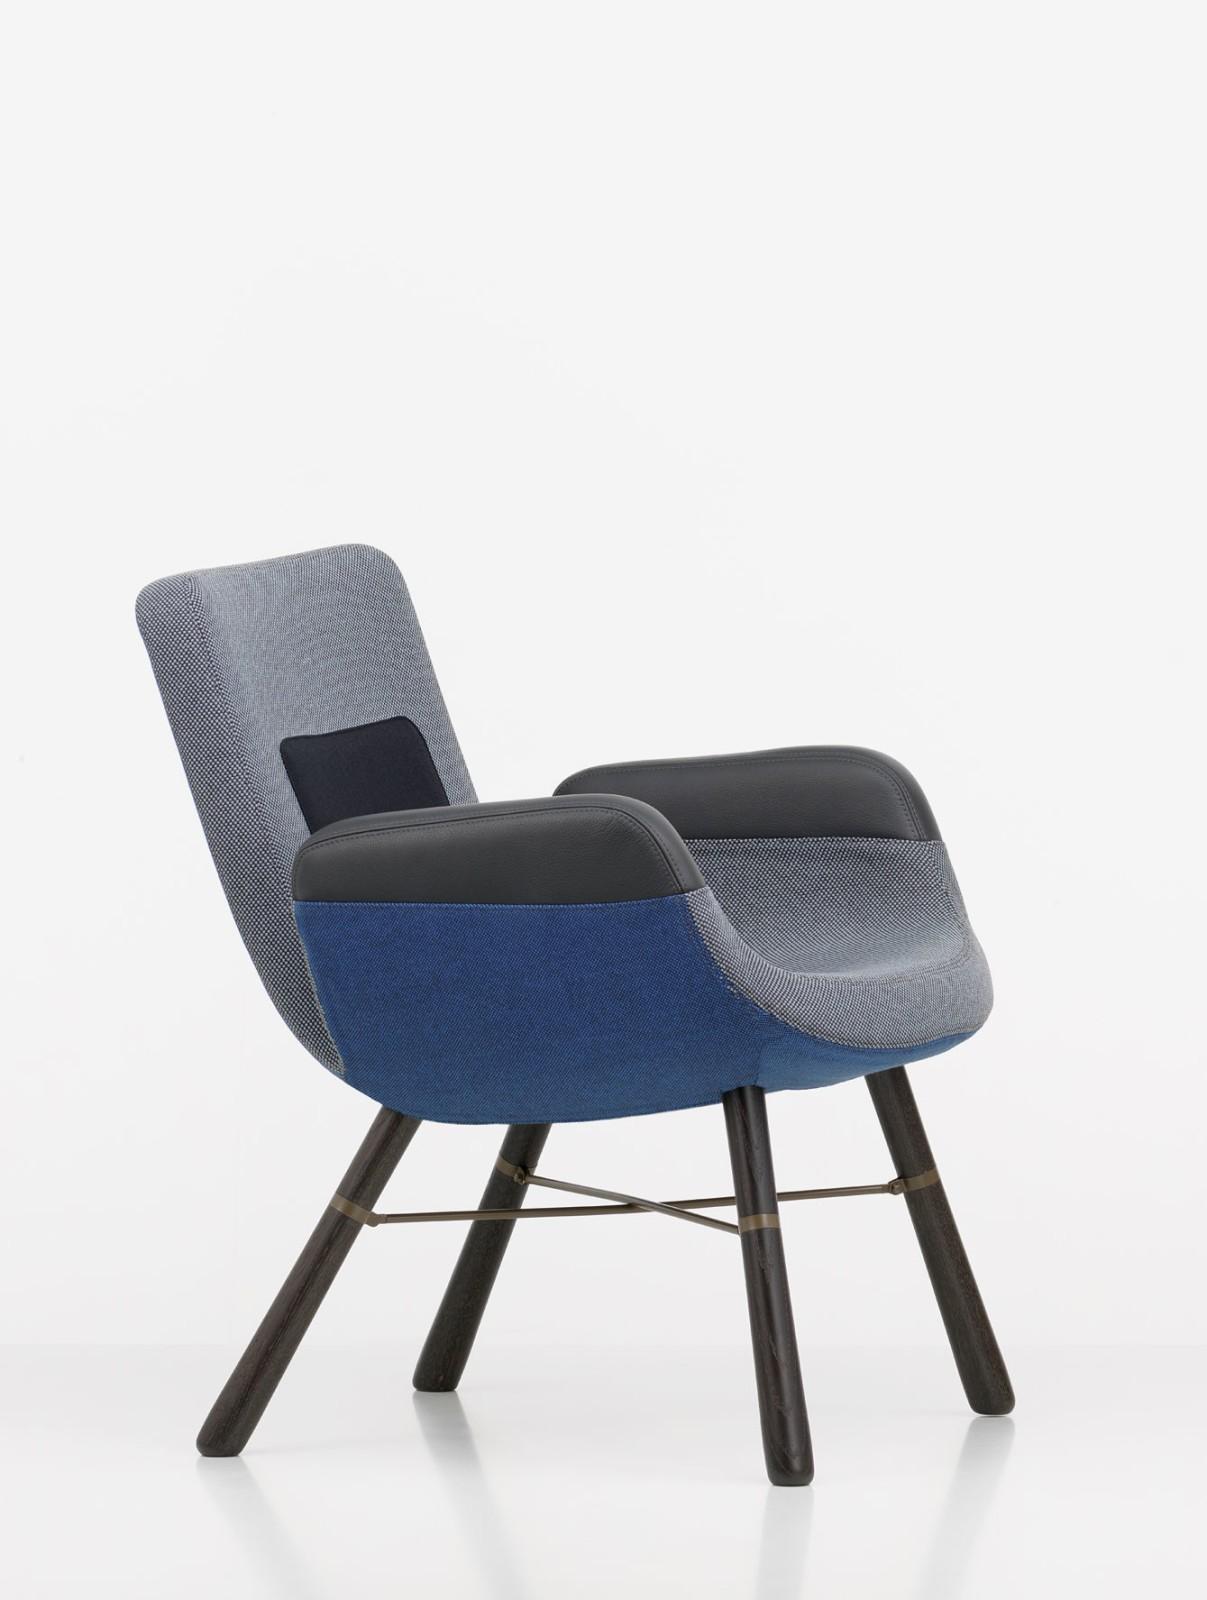 East River Chair Blue Mix Credo 05-Twill 07-Leather Premium 67-Hopsak 84, 04 dark oak protective van